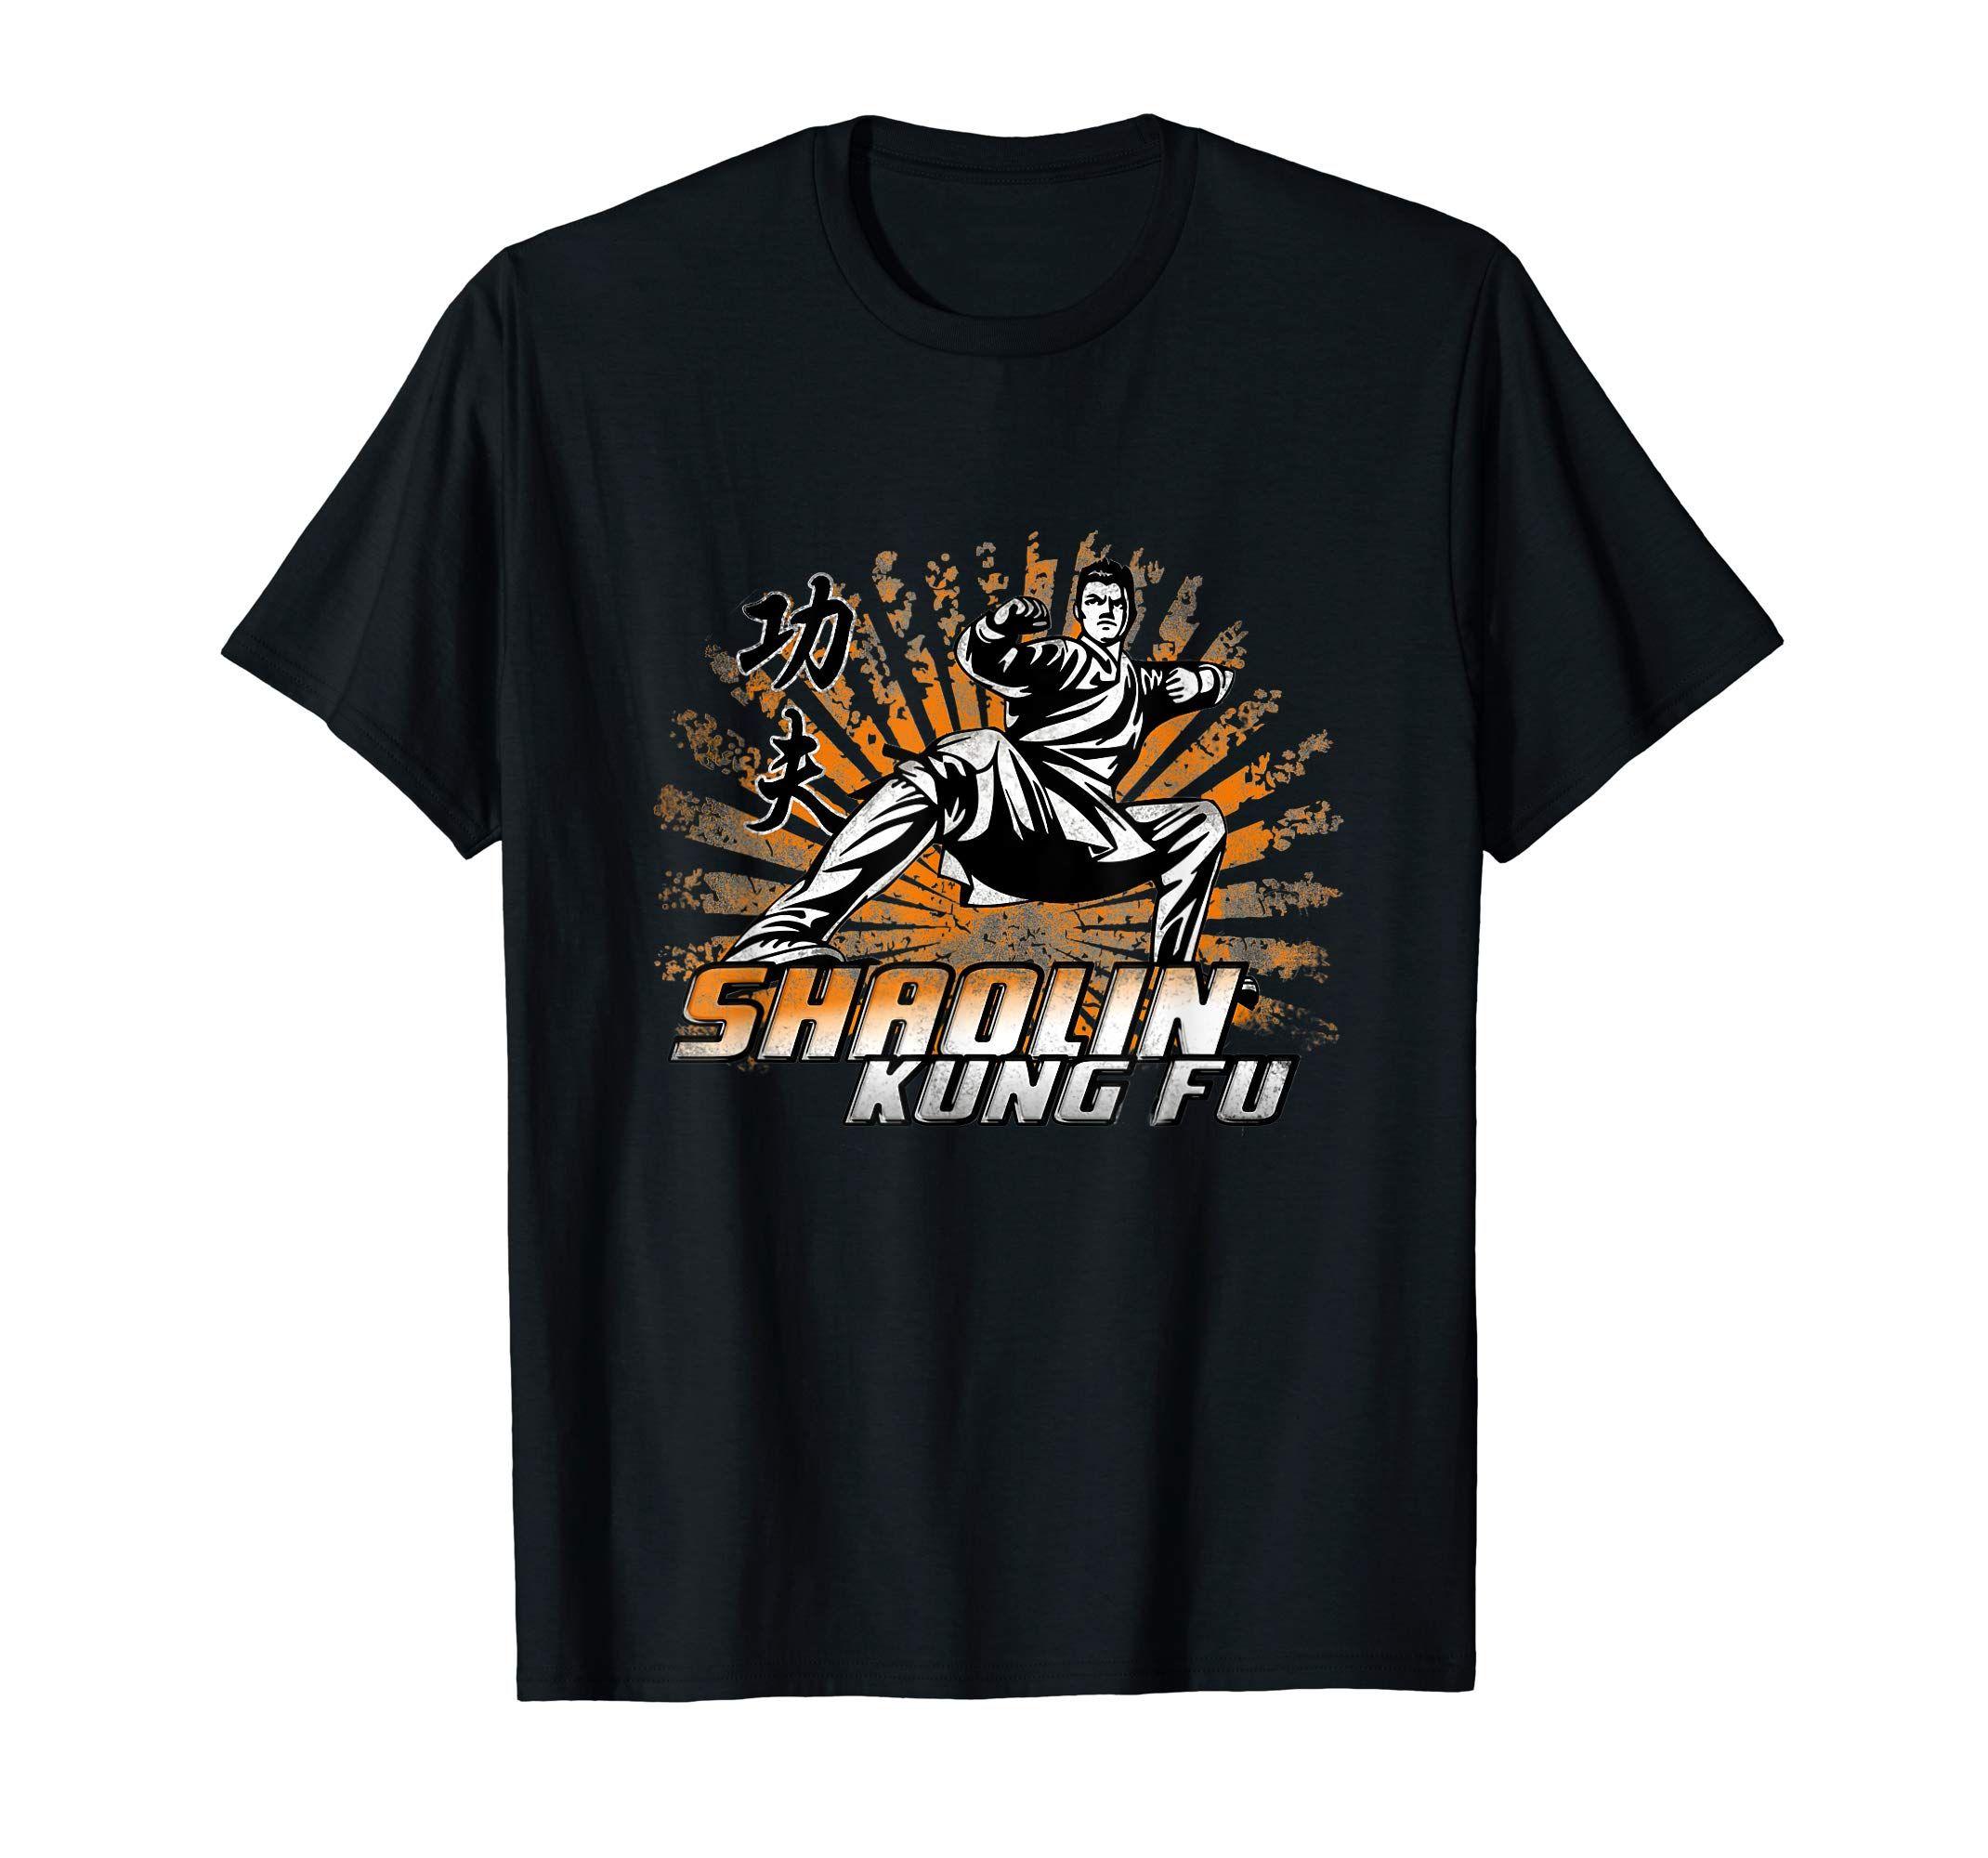 Amazon Com Shaolin Kung Fu T Shirt Gong Fu Master Chinese Martial Art Clothing Shaolin Kung Fu Chinese Martial Arts Shaolin